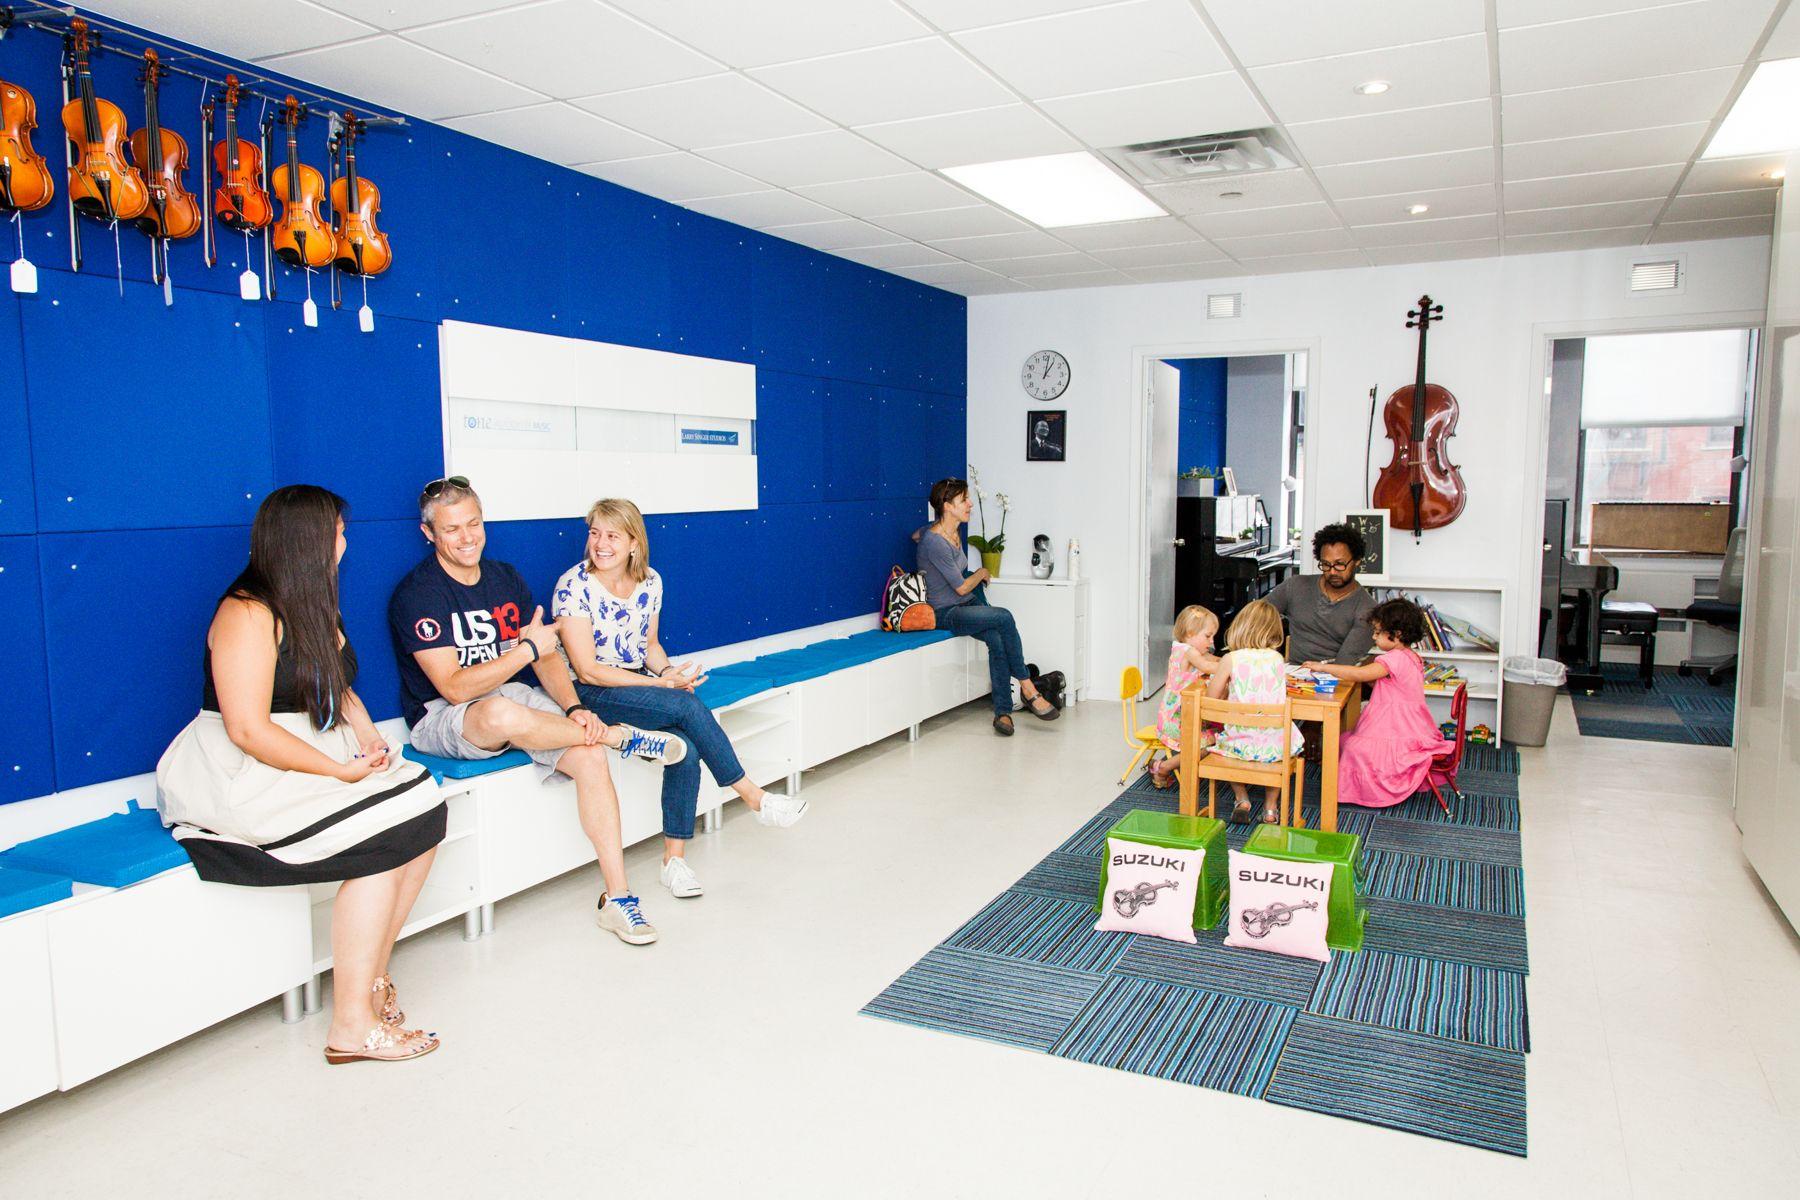 Music school sound proofing cello violin school organization organizing studio